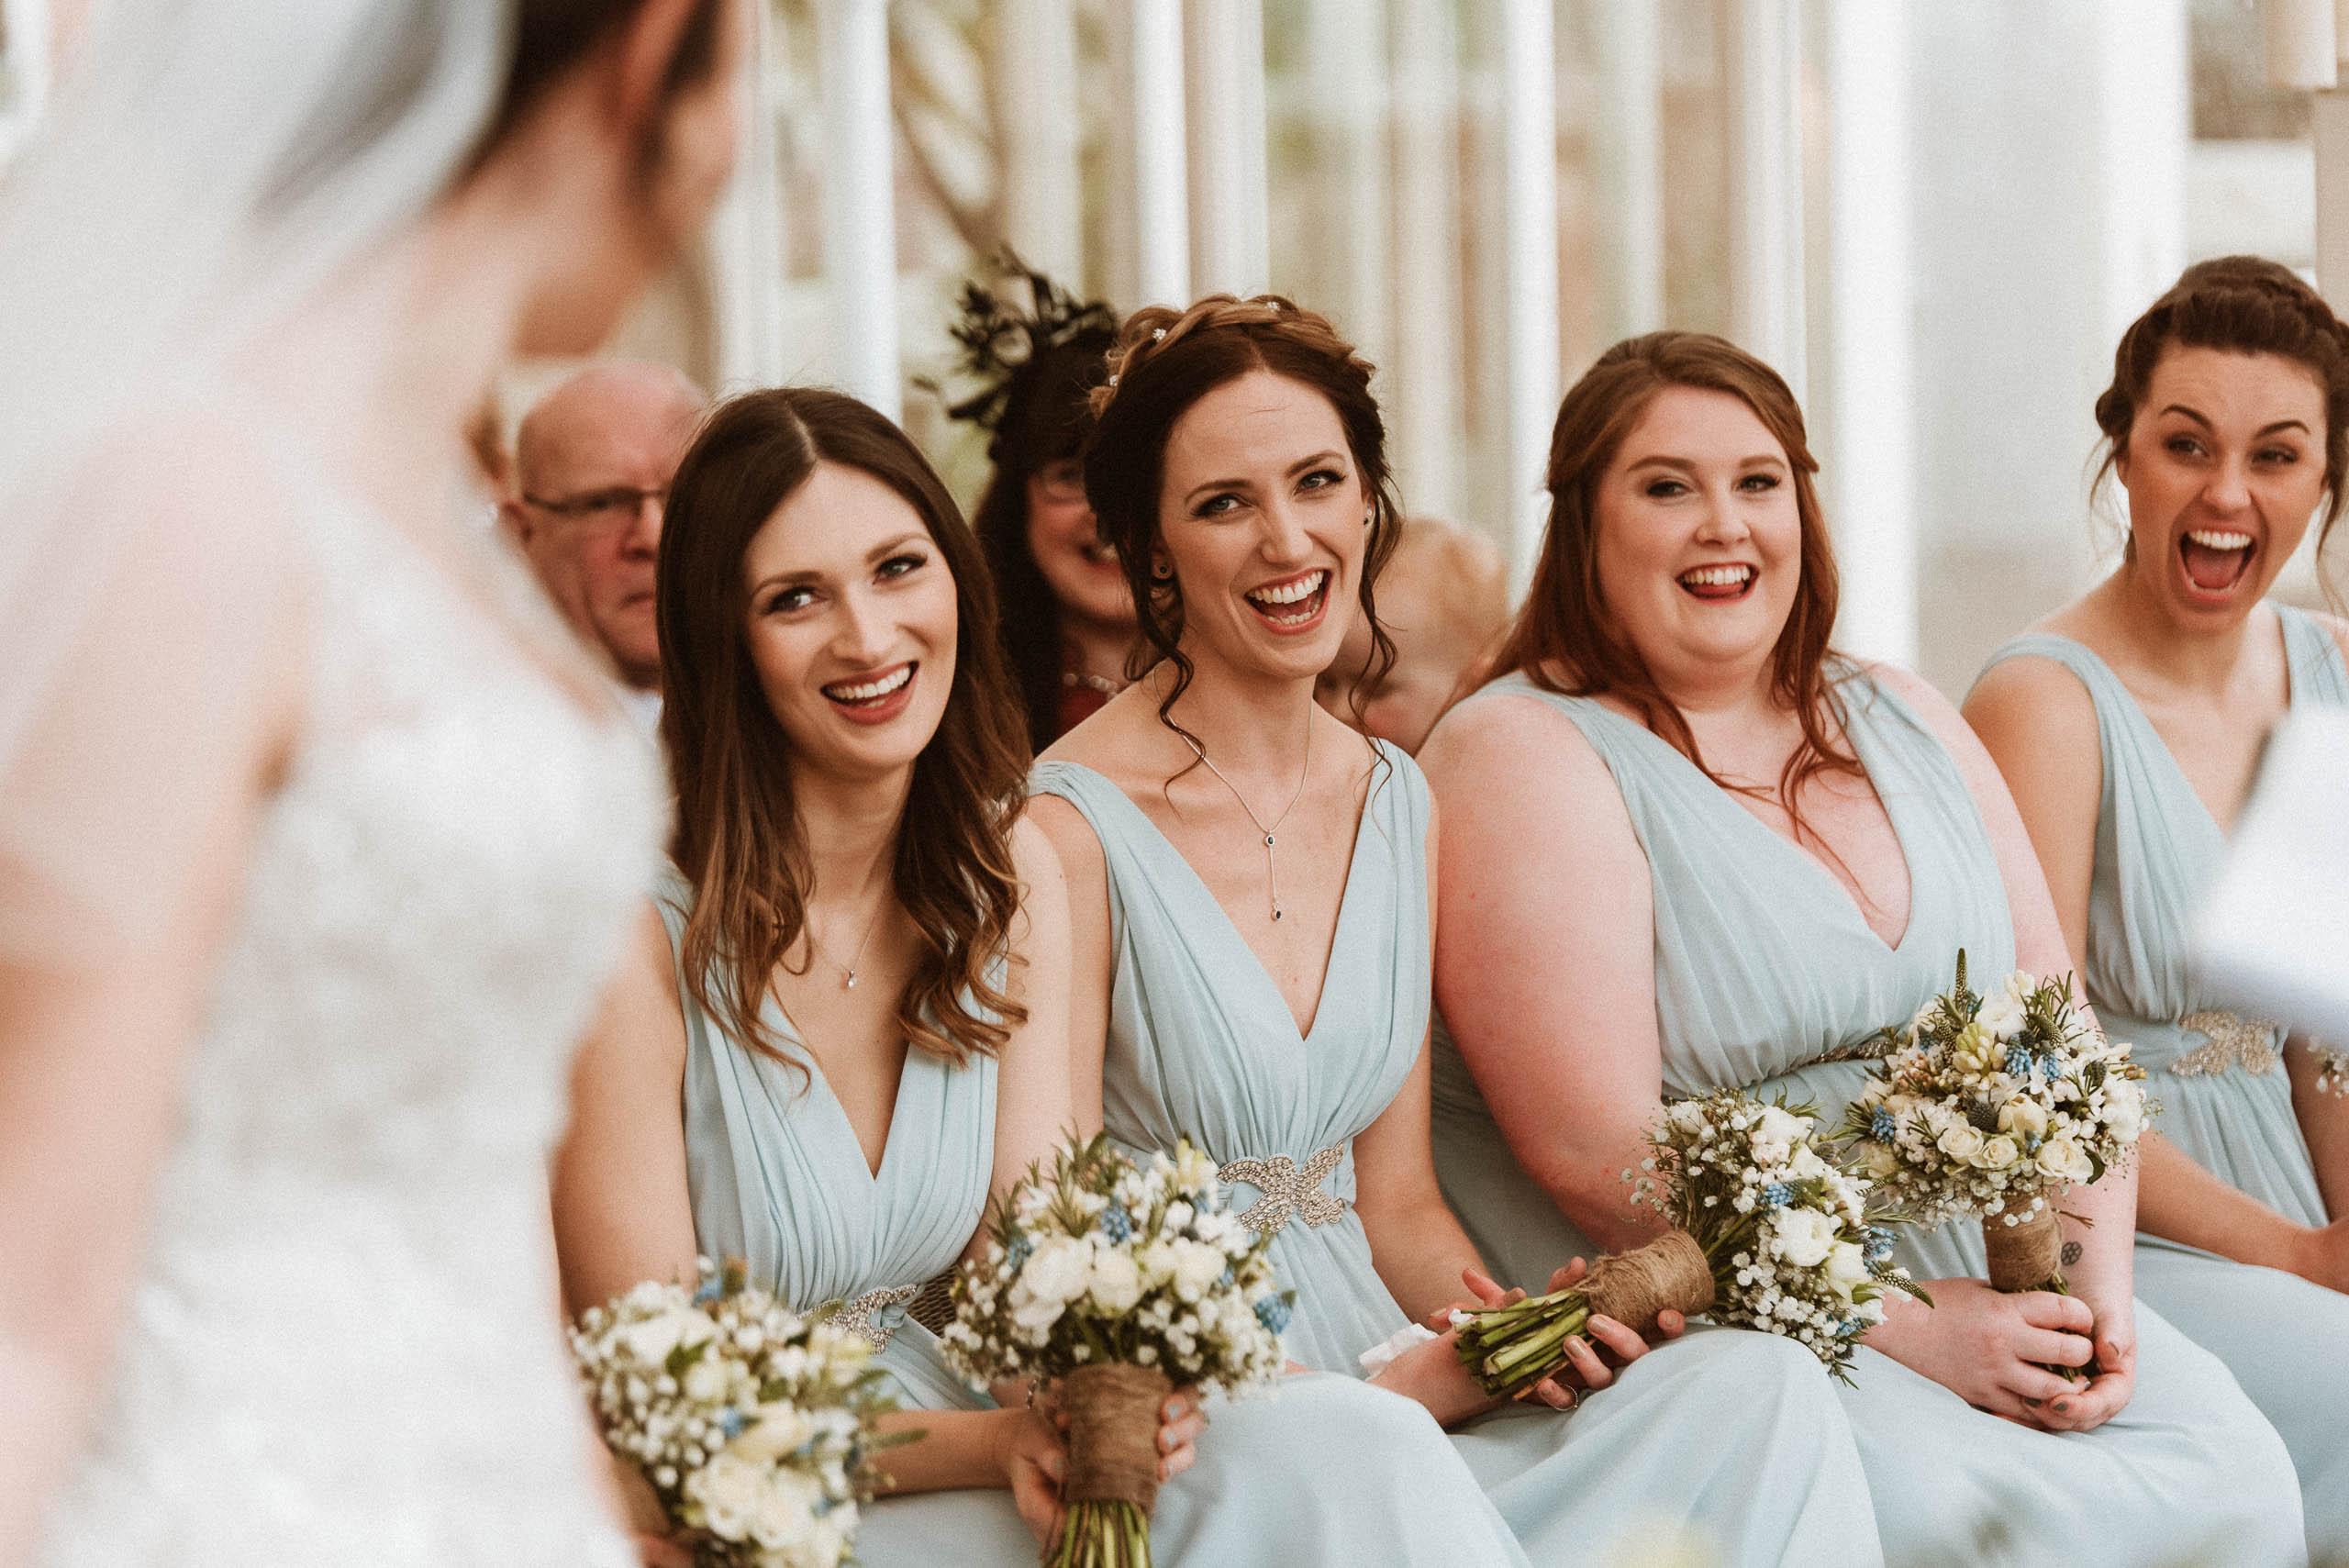 bridesmaids all smiling